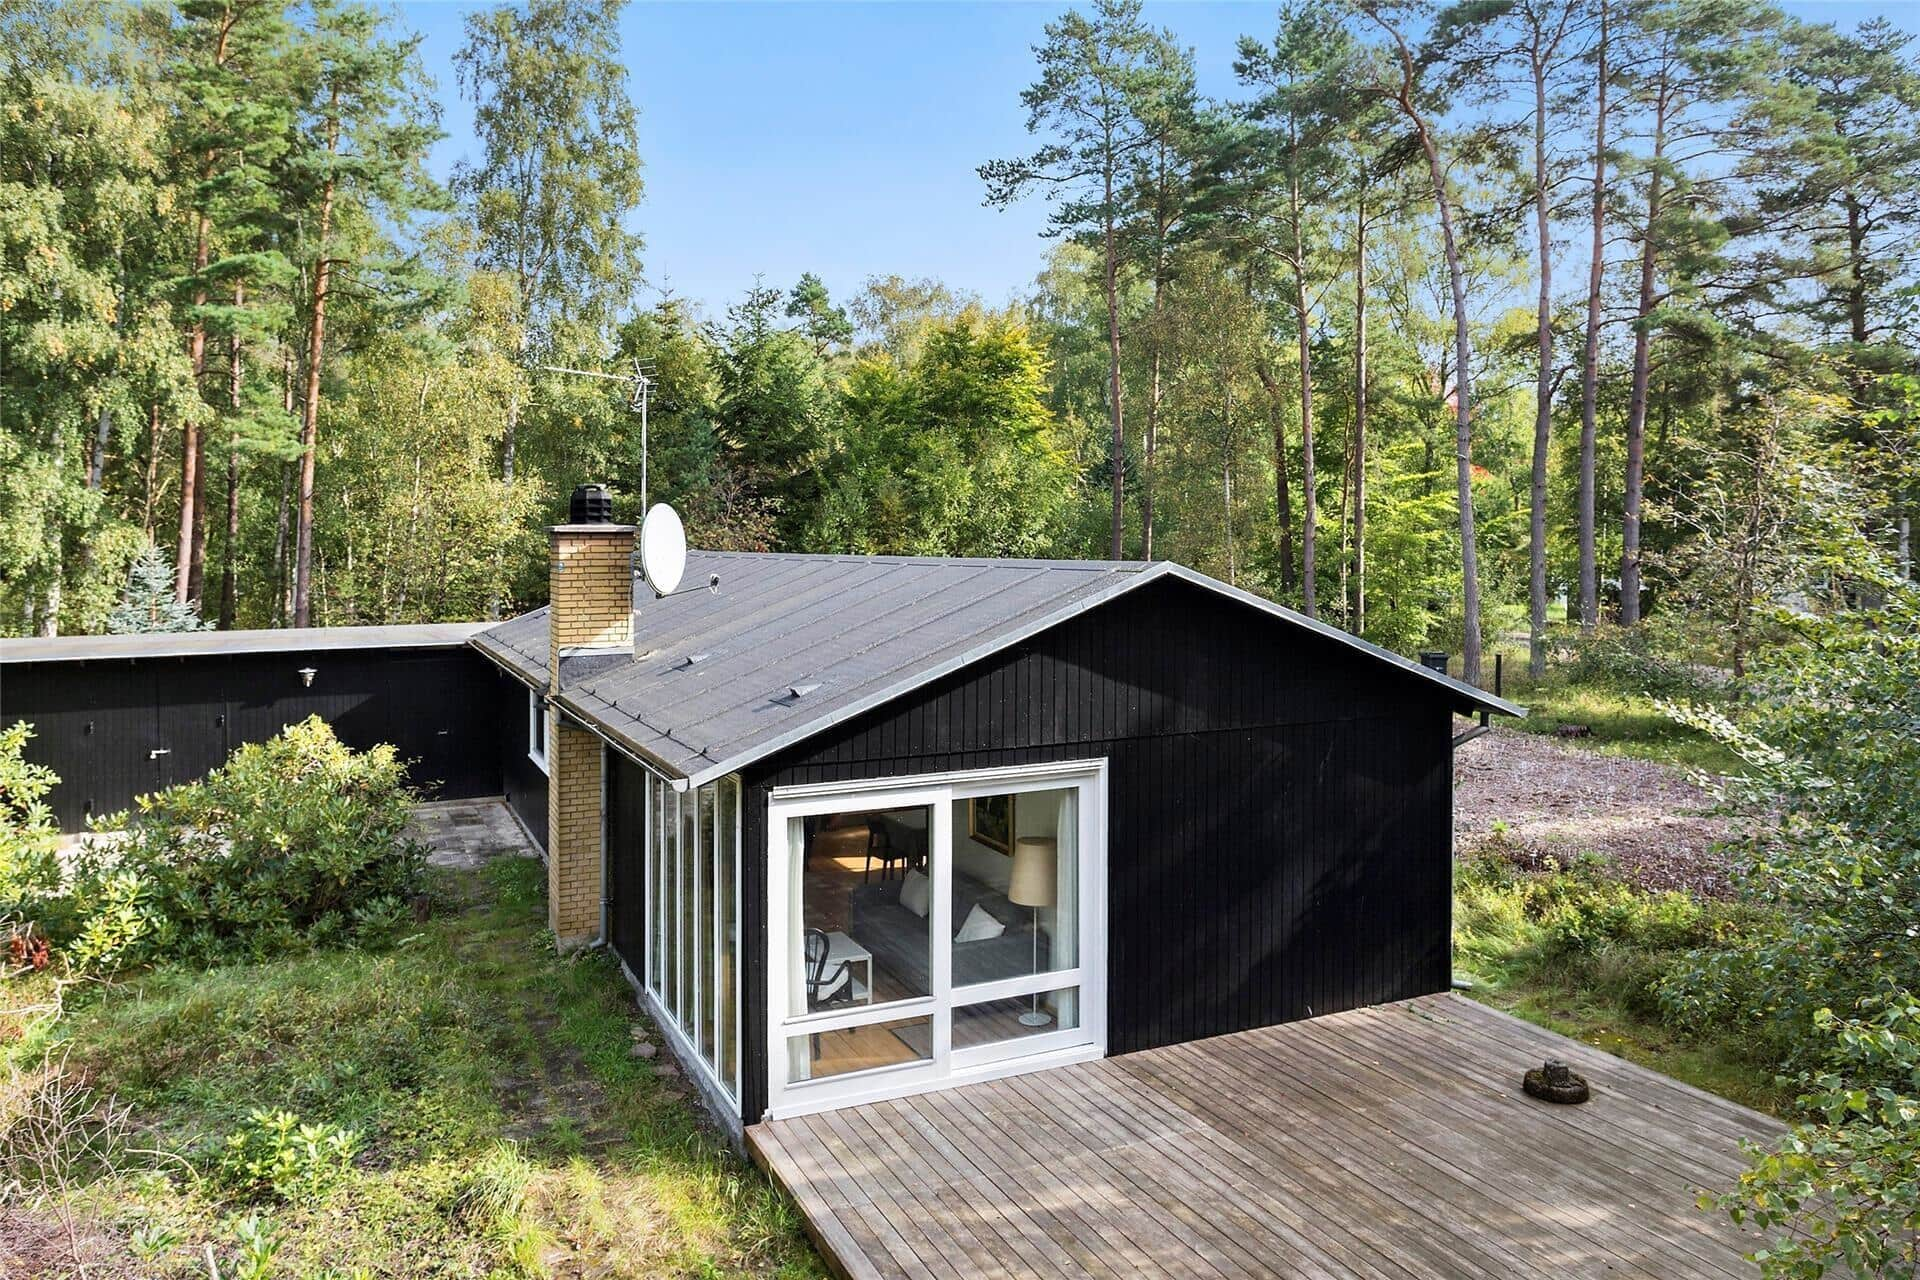 Bild 1-15 Stuga 2023, Horsnæsvej 6, DK - 4780 Stege